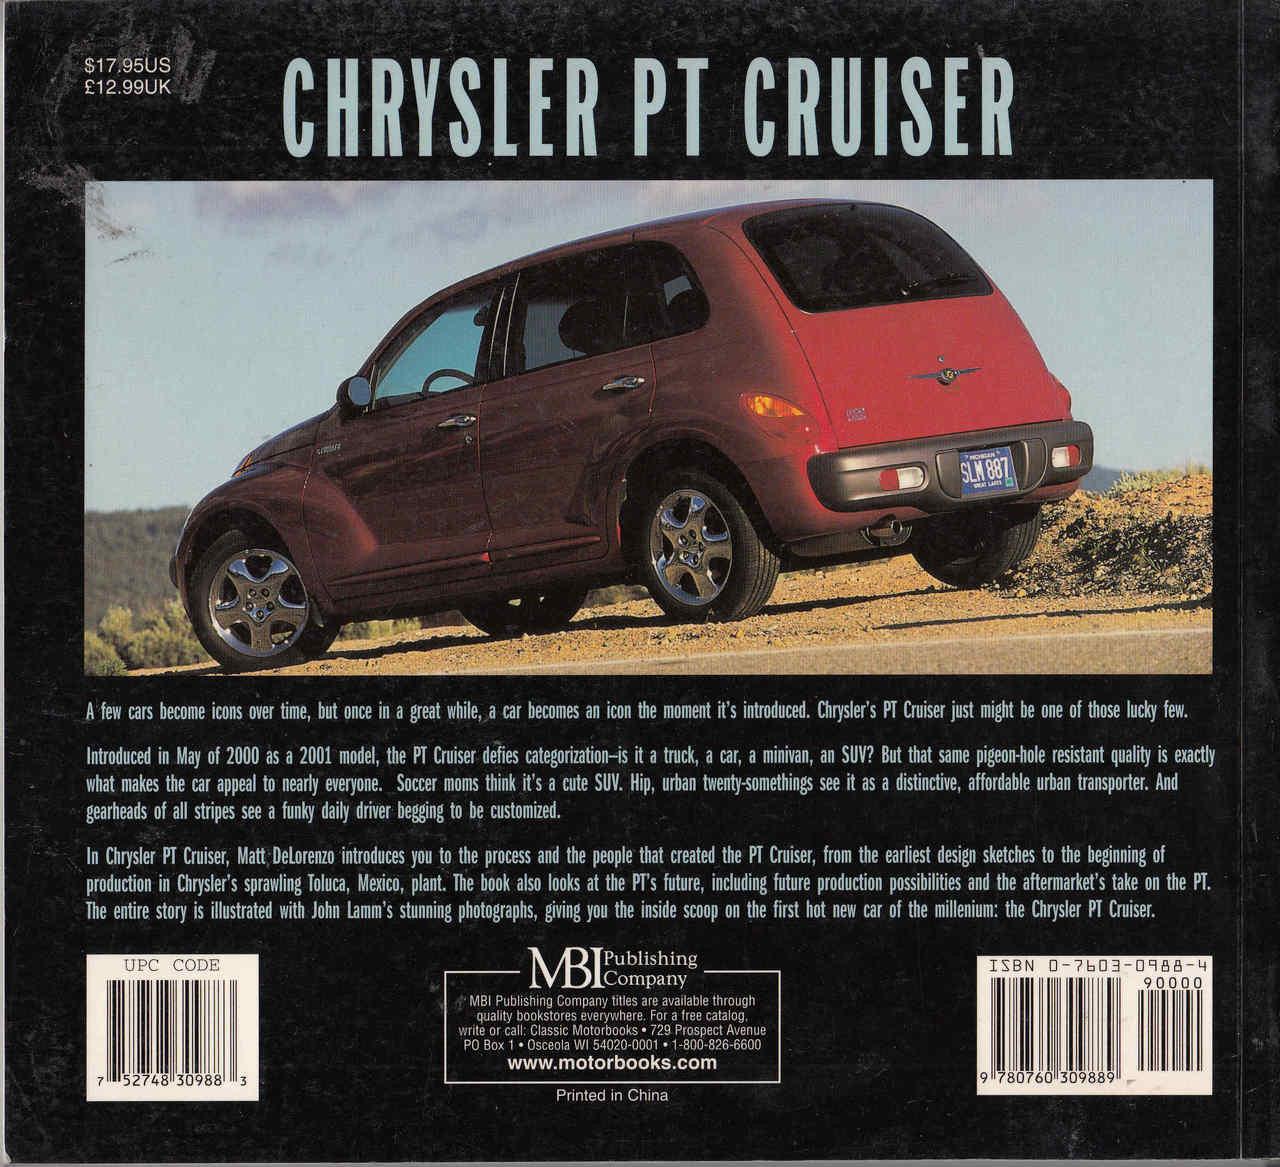 Chrysler pt cruiser motorbooks colortech back